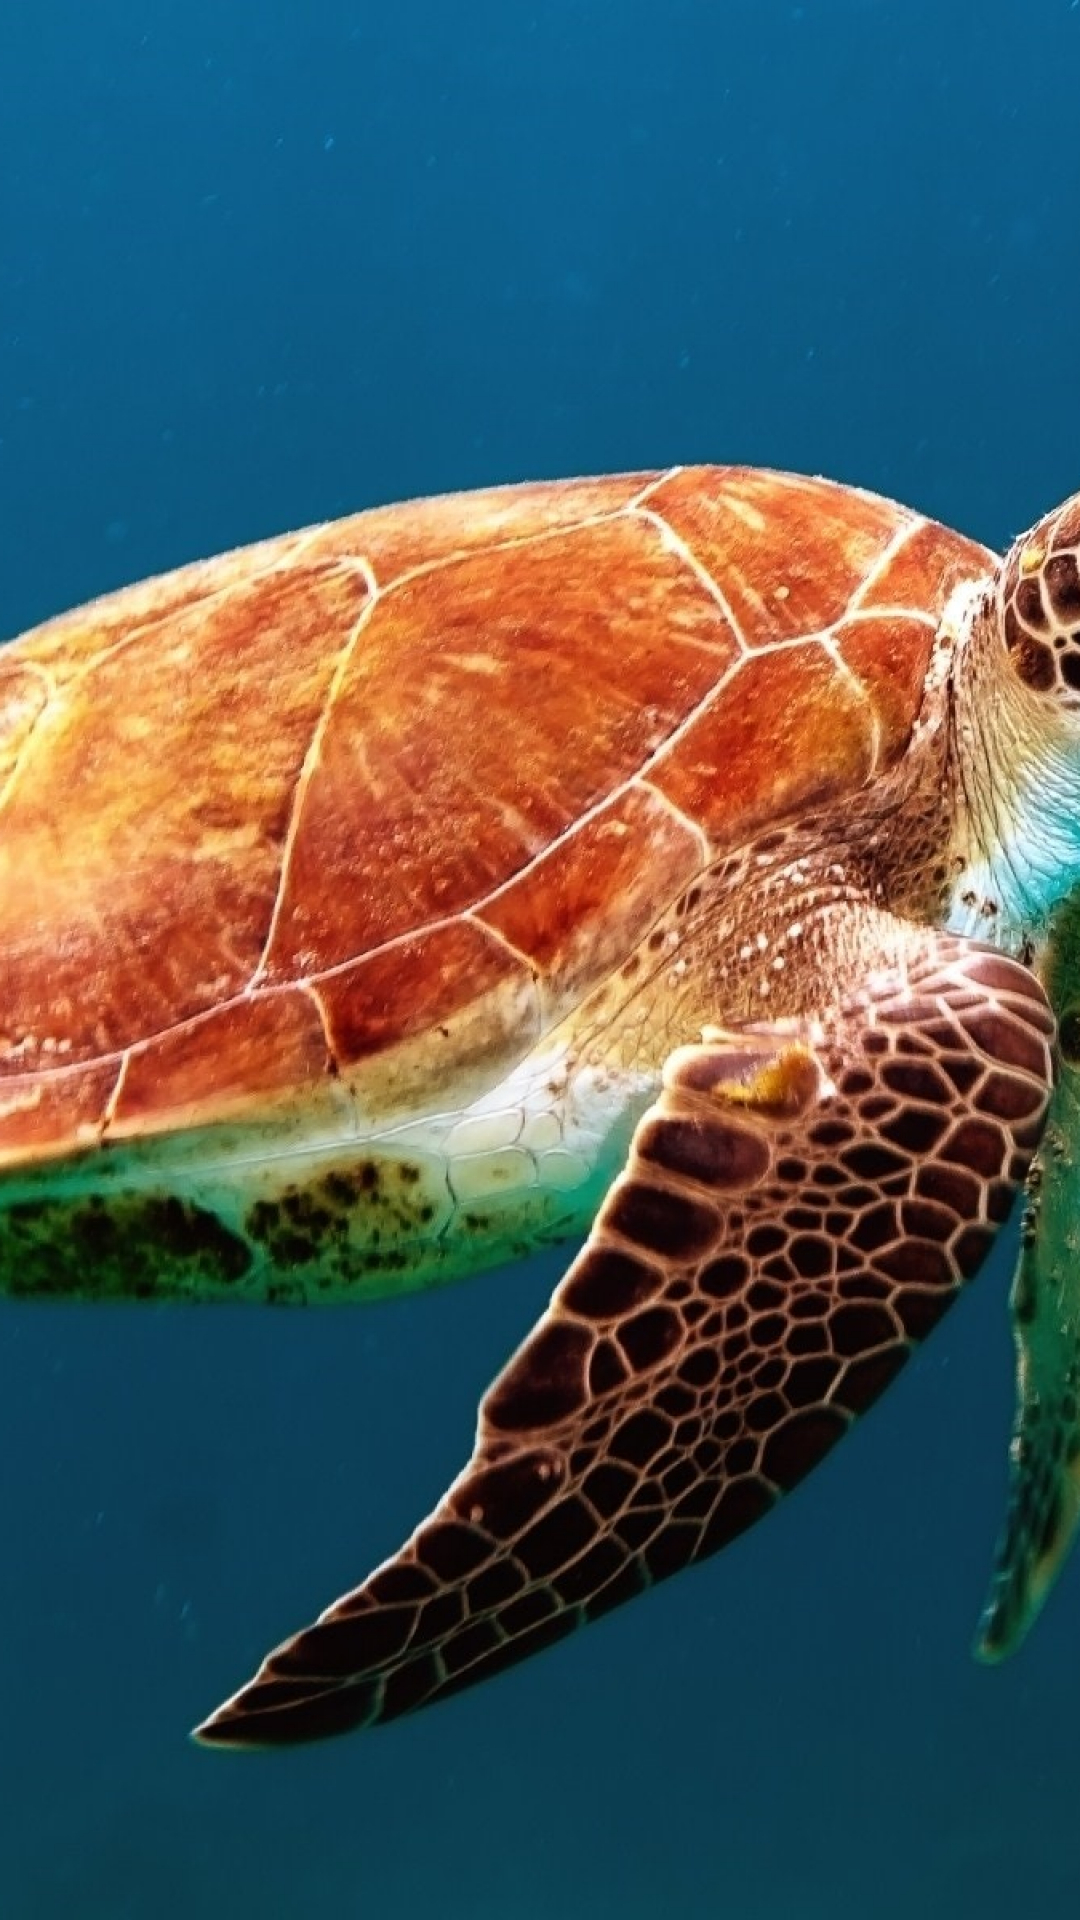 Turtle Iphone Wallpaper Idrop News